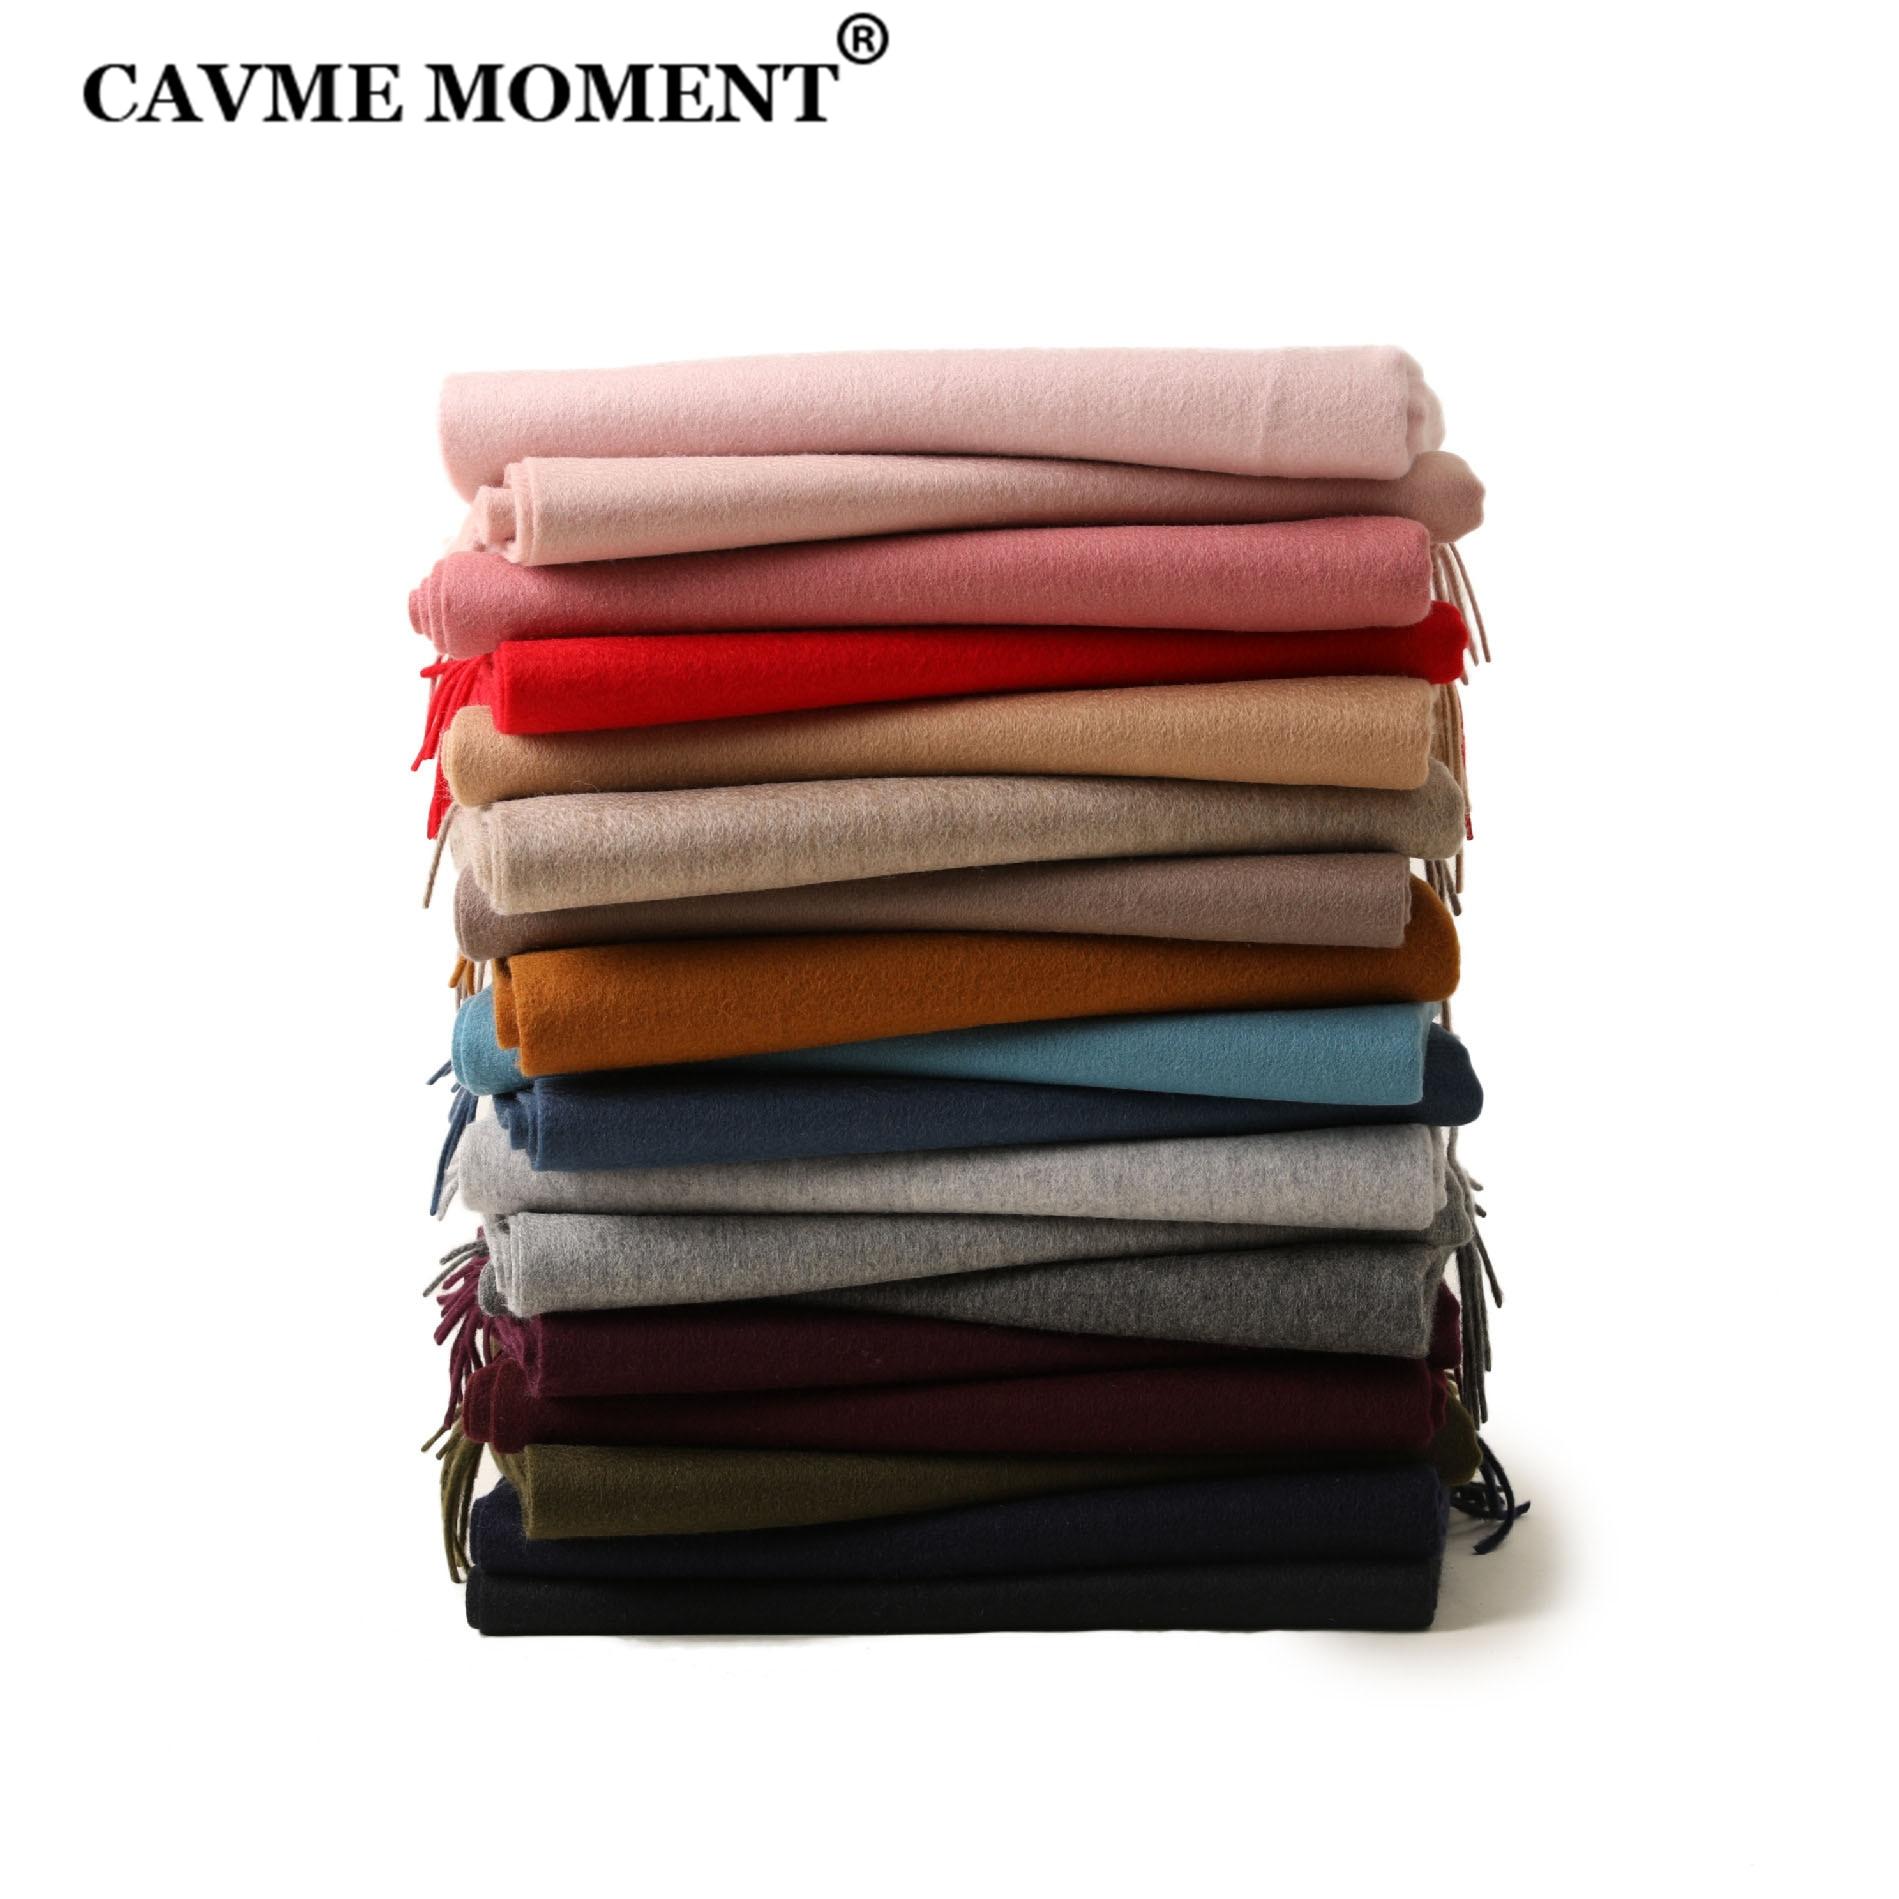 CAVME وشاح من الصوف الخالص للجنسين الباشمينا الأساسية الأوشحة الطويلة بلون شالات 70*180 سنتيمتر هدية لعيد الميلاد خطابات مخصصة